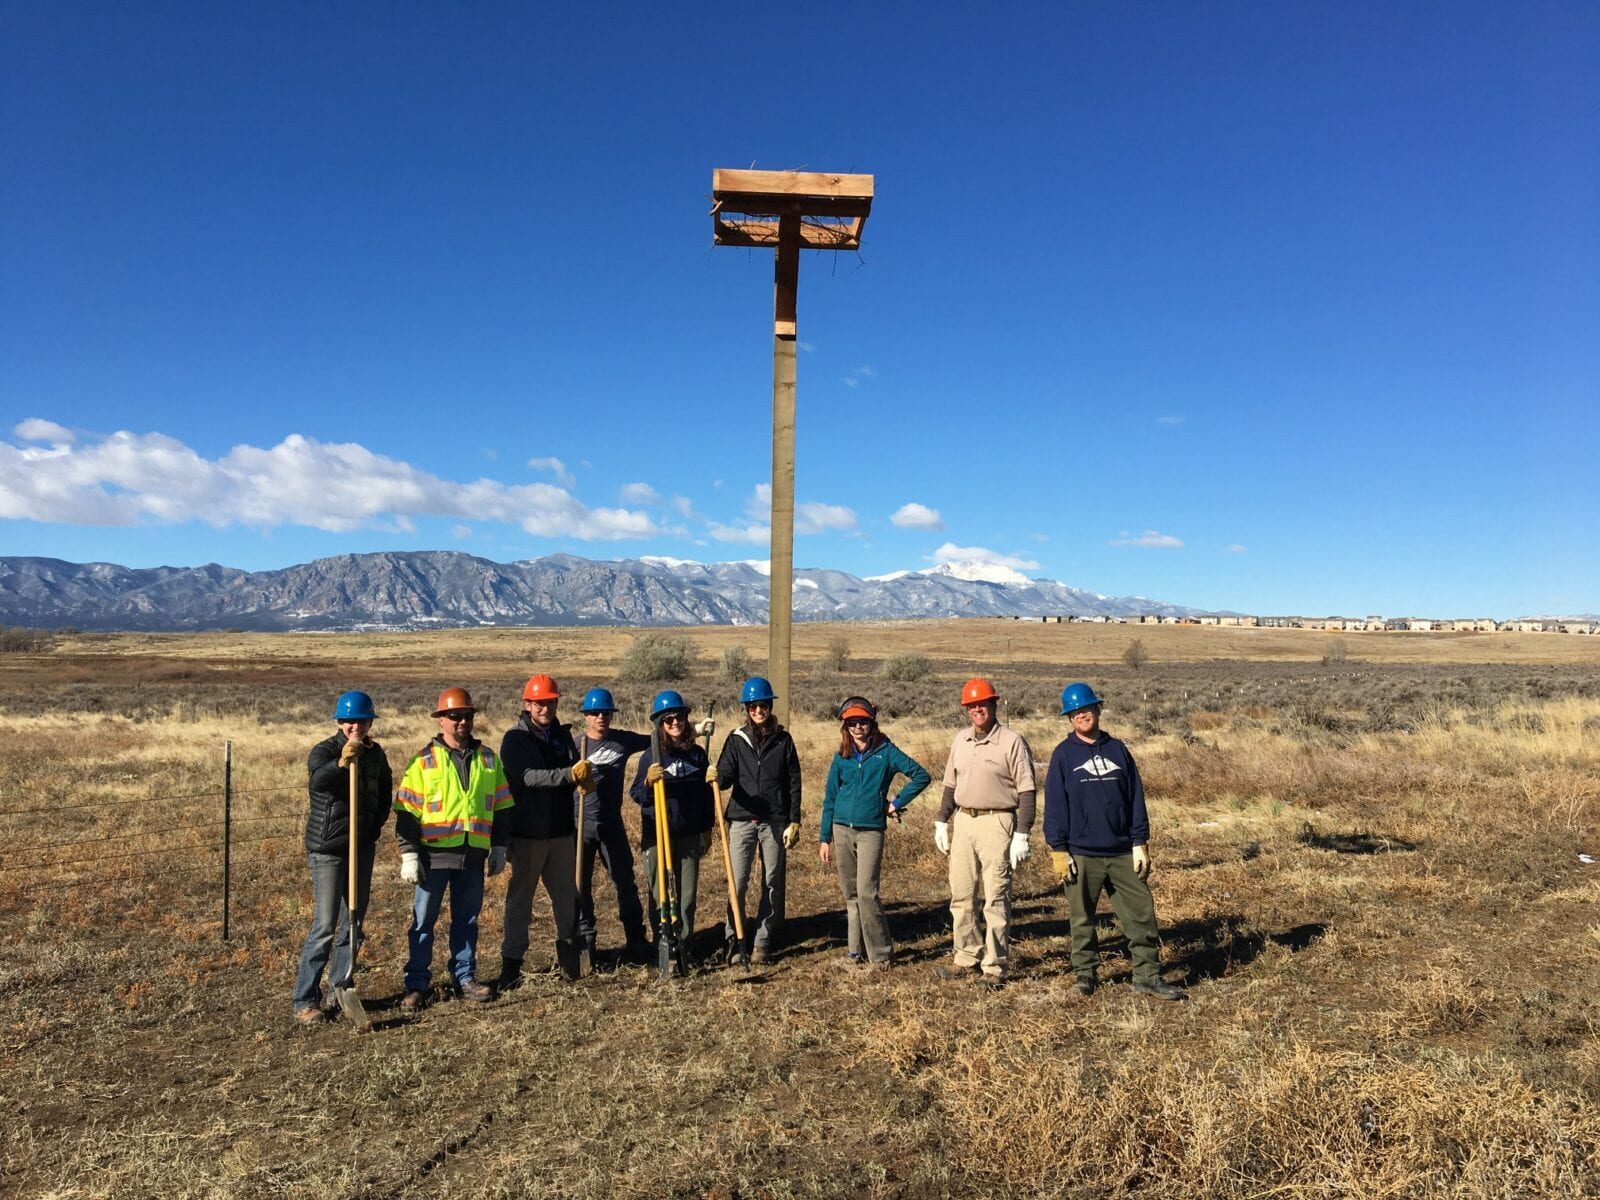 Image of the regional parks team installing bird nest boxes in Bluestem Prairie Open Space